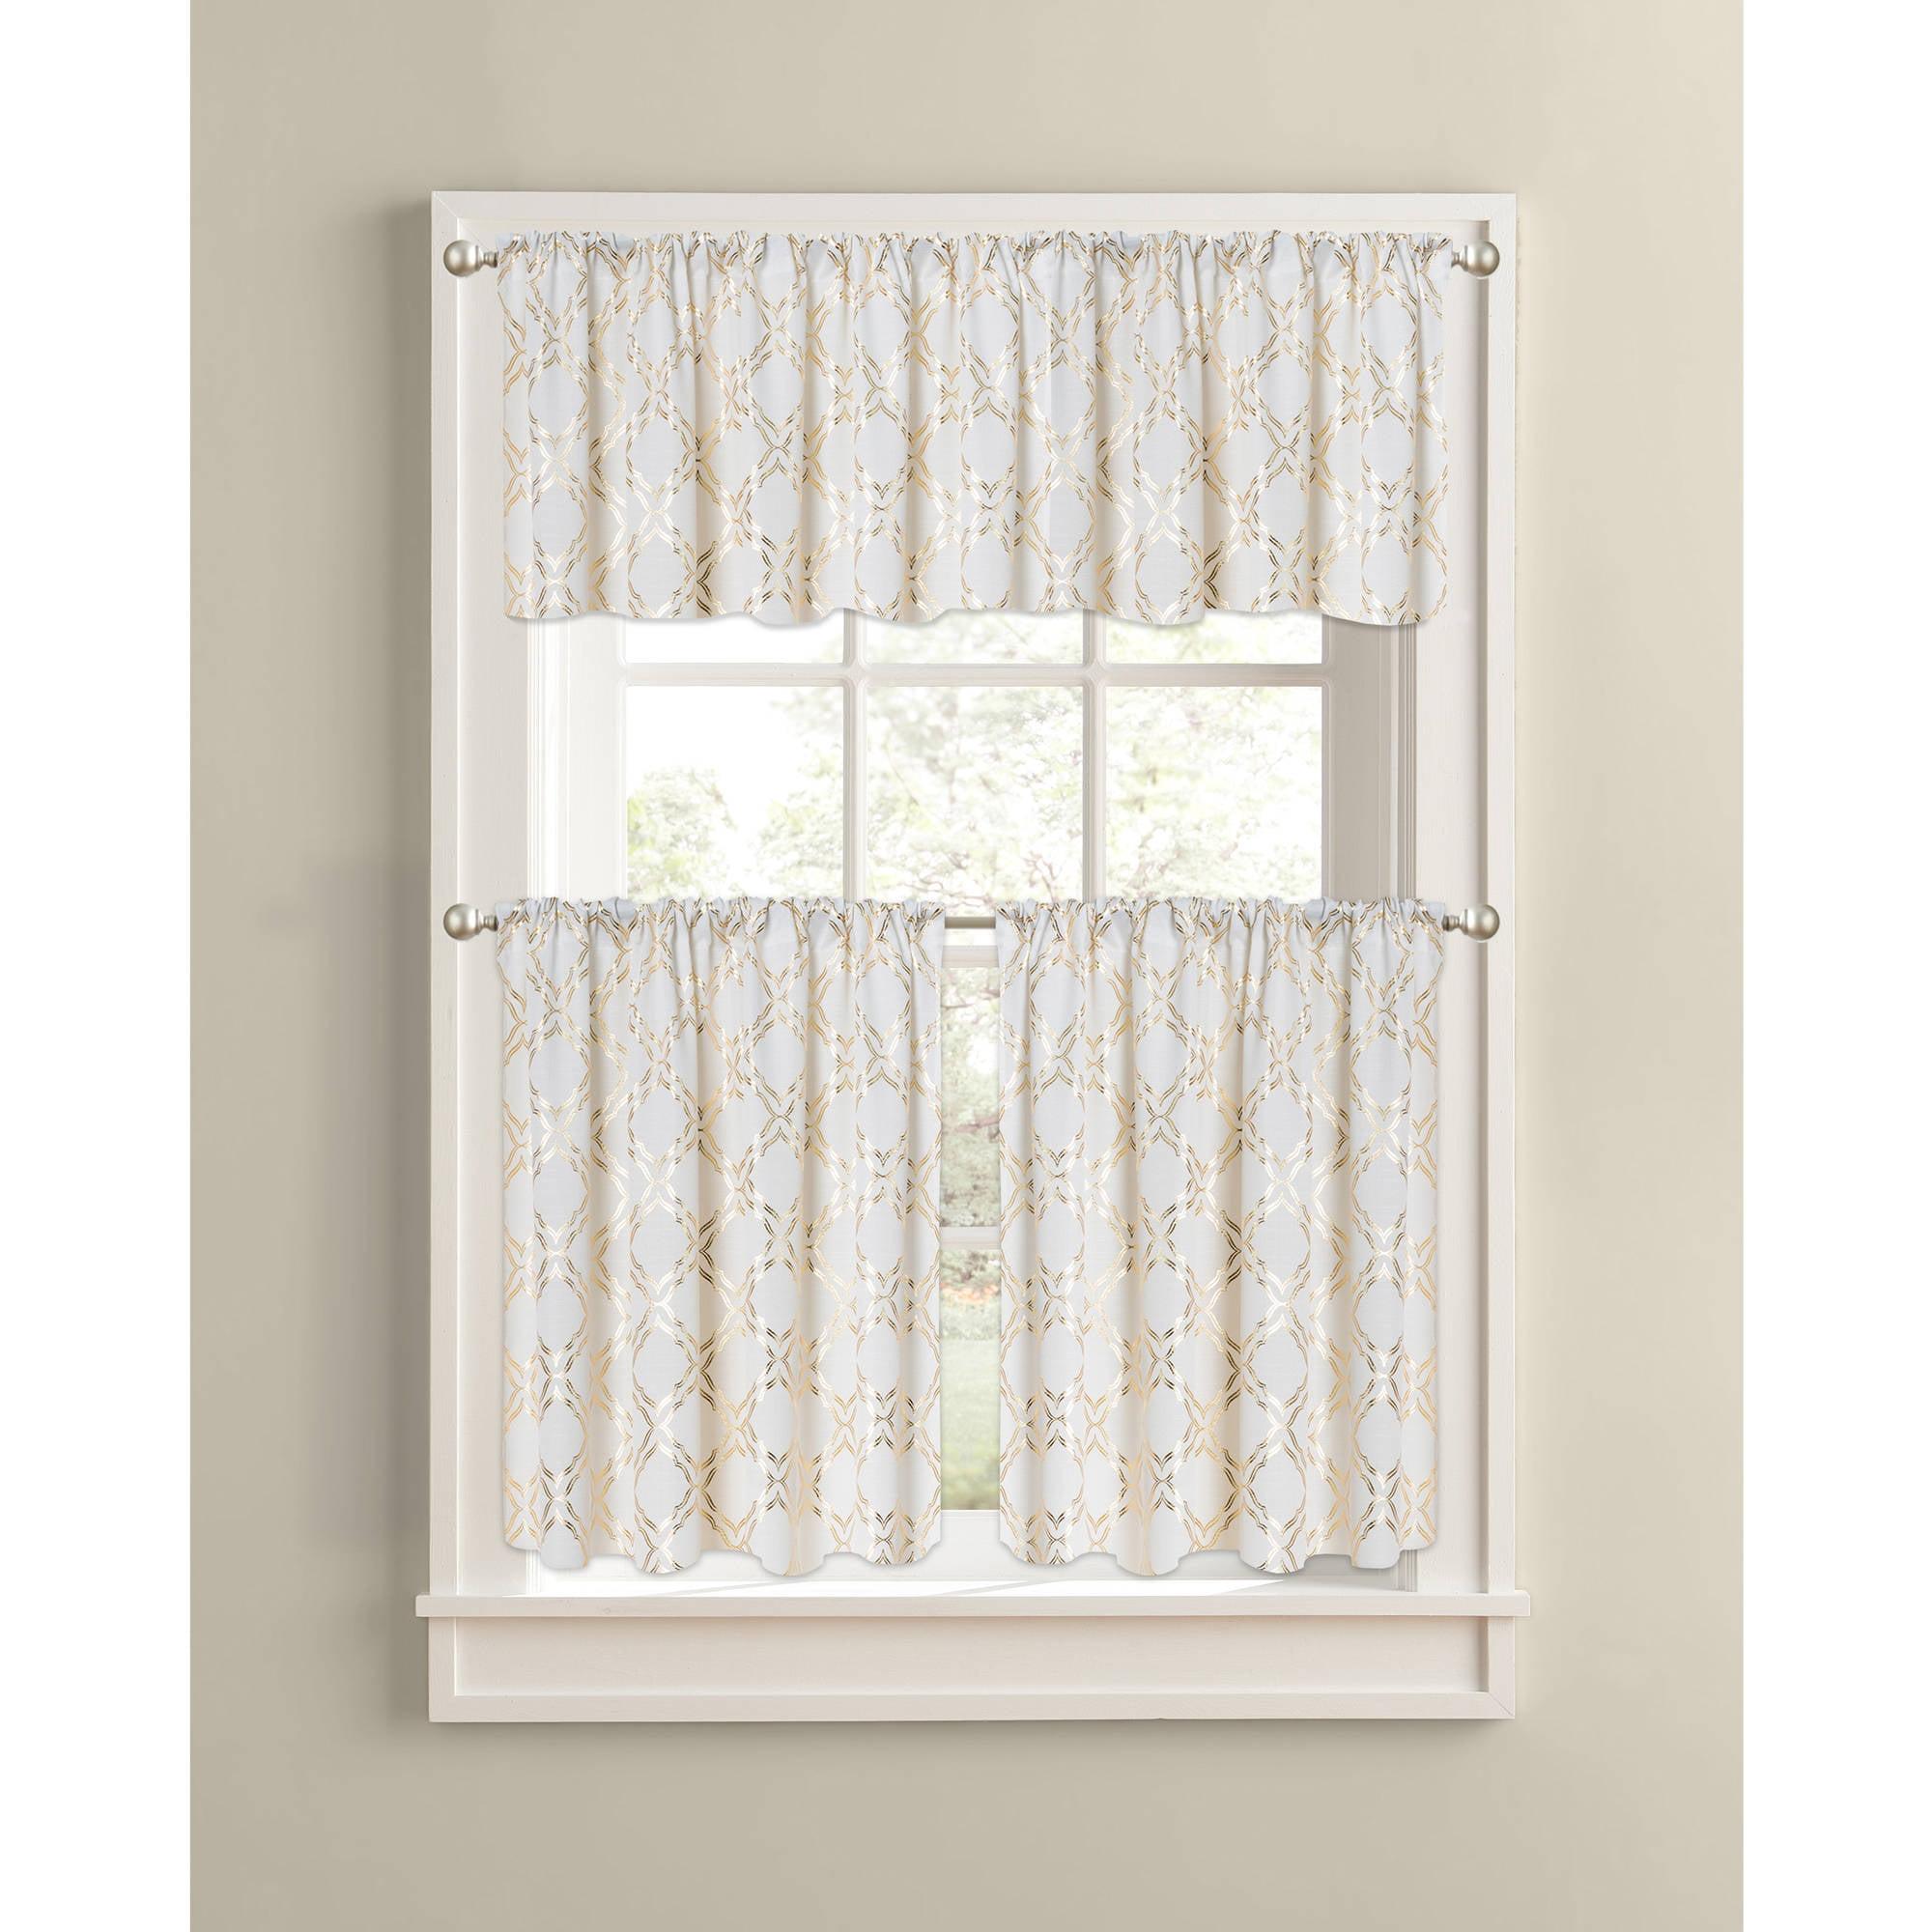 Charming Better Homes And Gardens Metallic Gold Trellis Kitchen Curtains, Set Of 2    Walmart.com